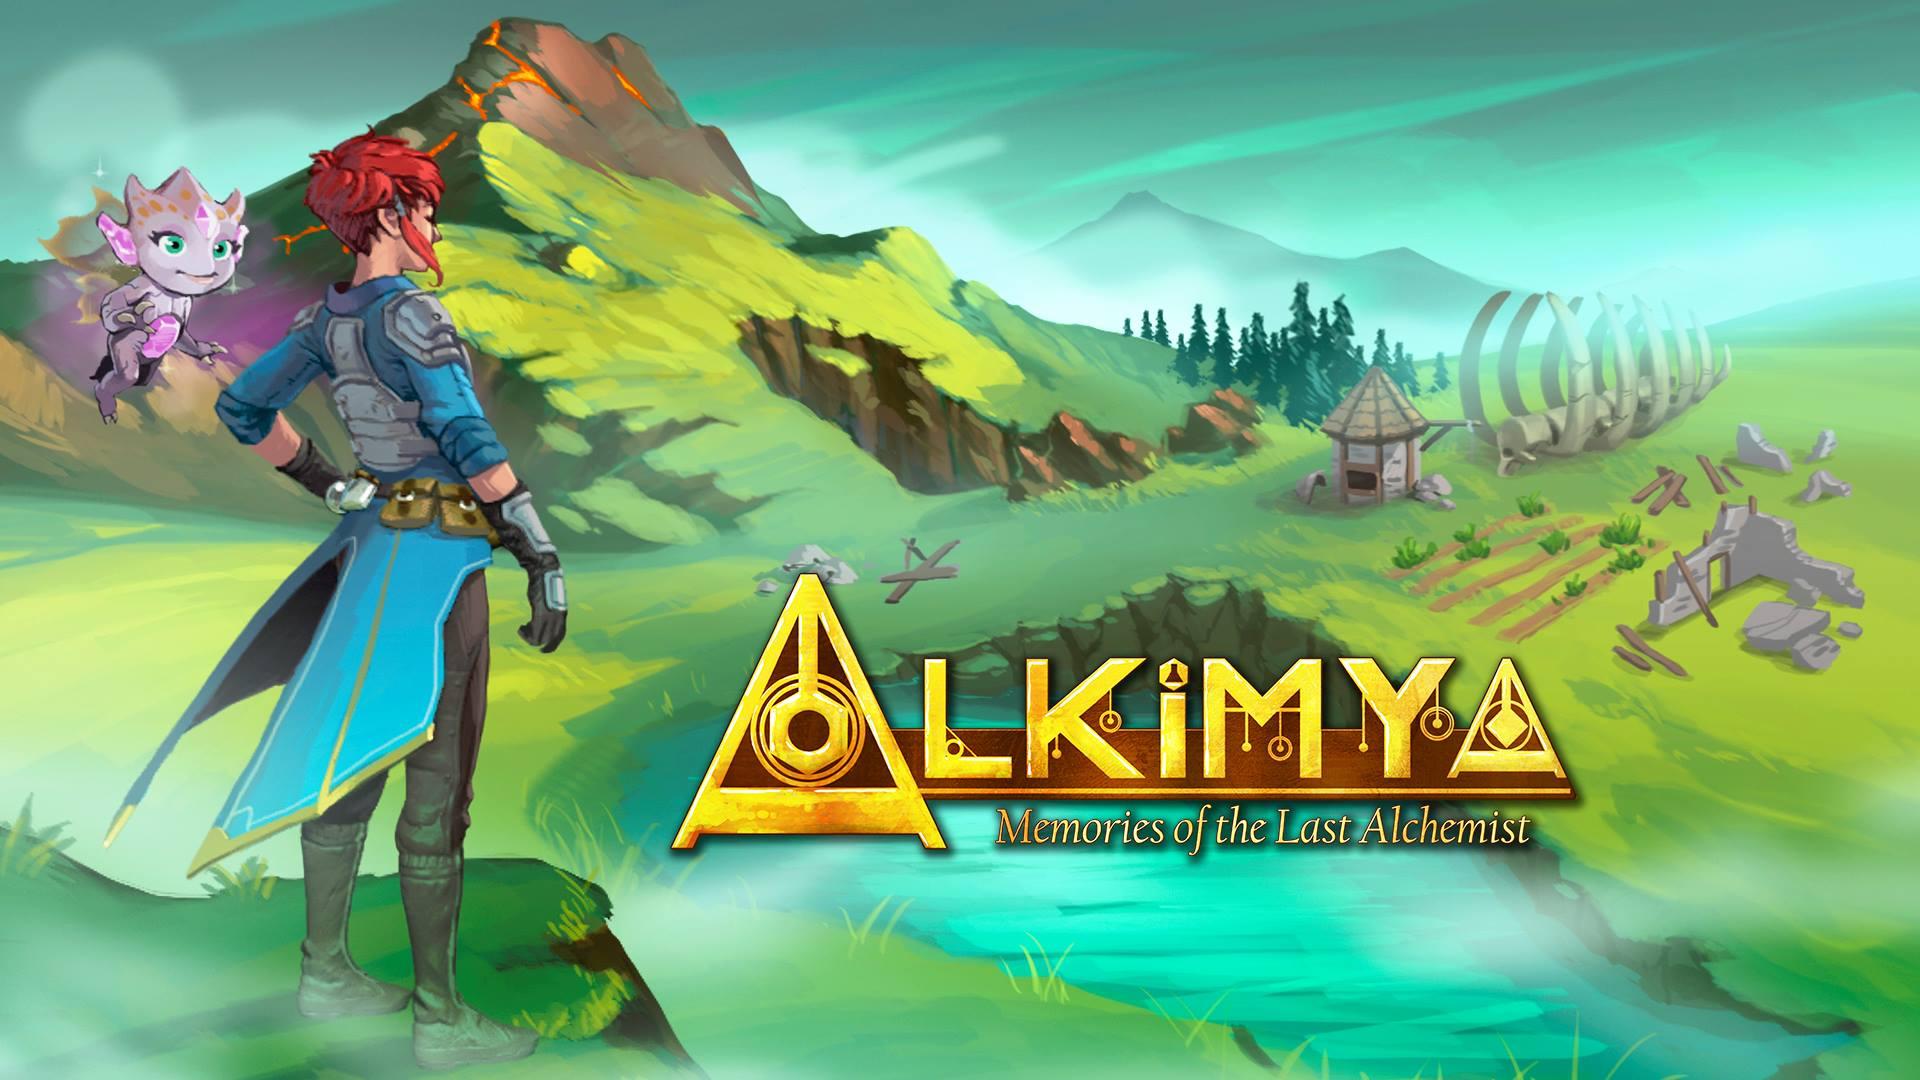 Alkimya: Memories of the Last Alchemist